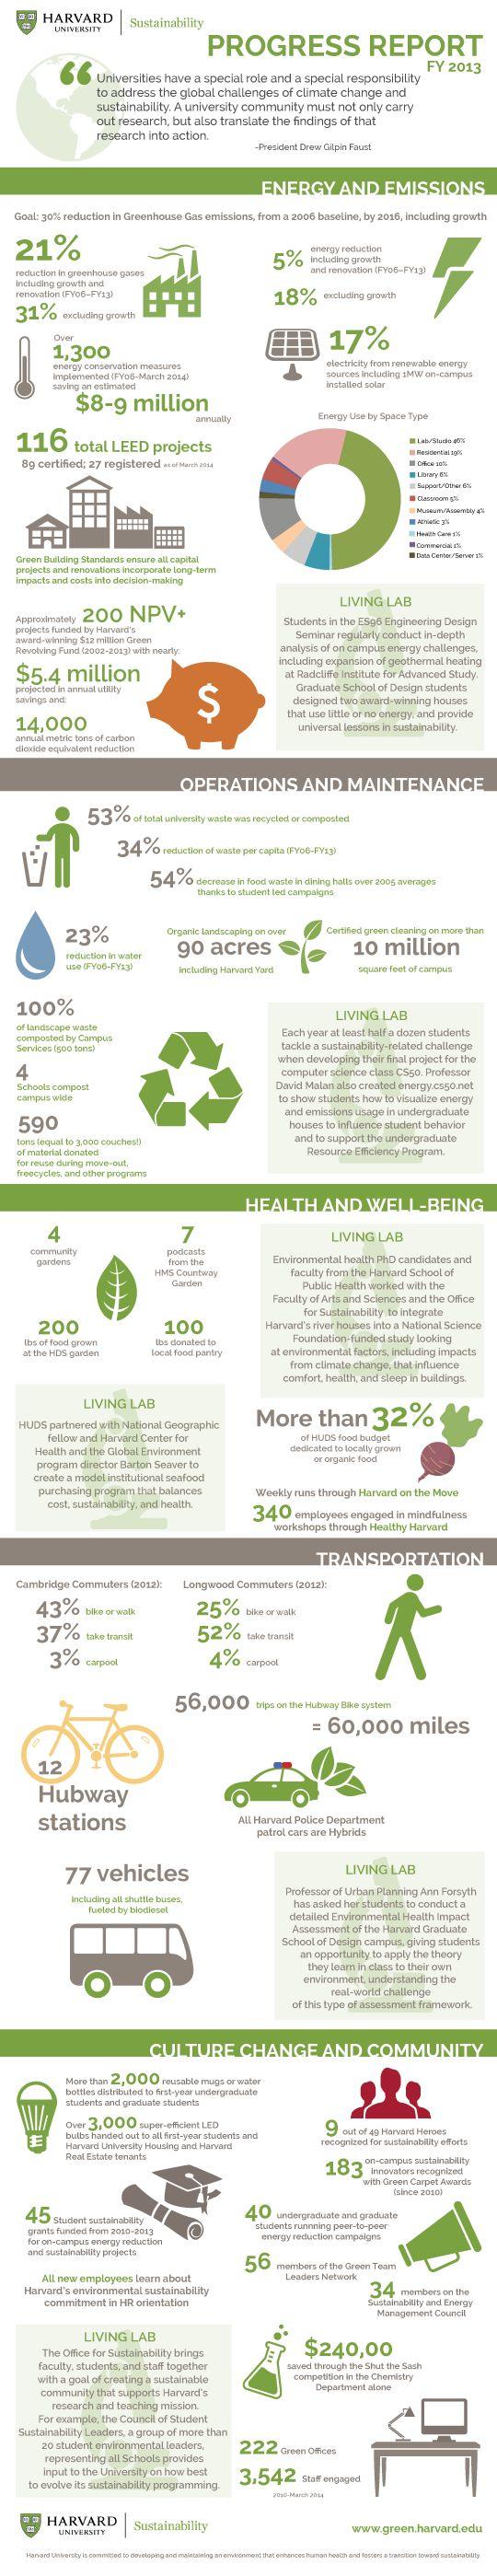 Sustainability Progress Report | Sustainability at Harvard Impact Report